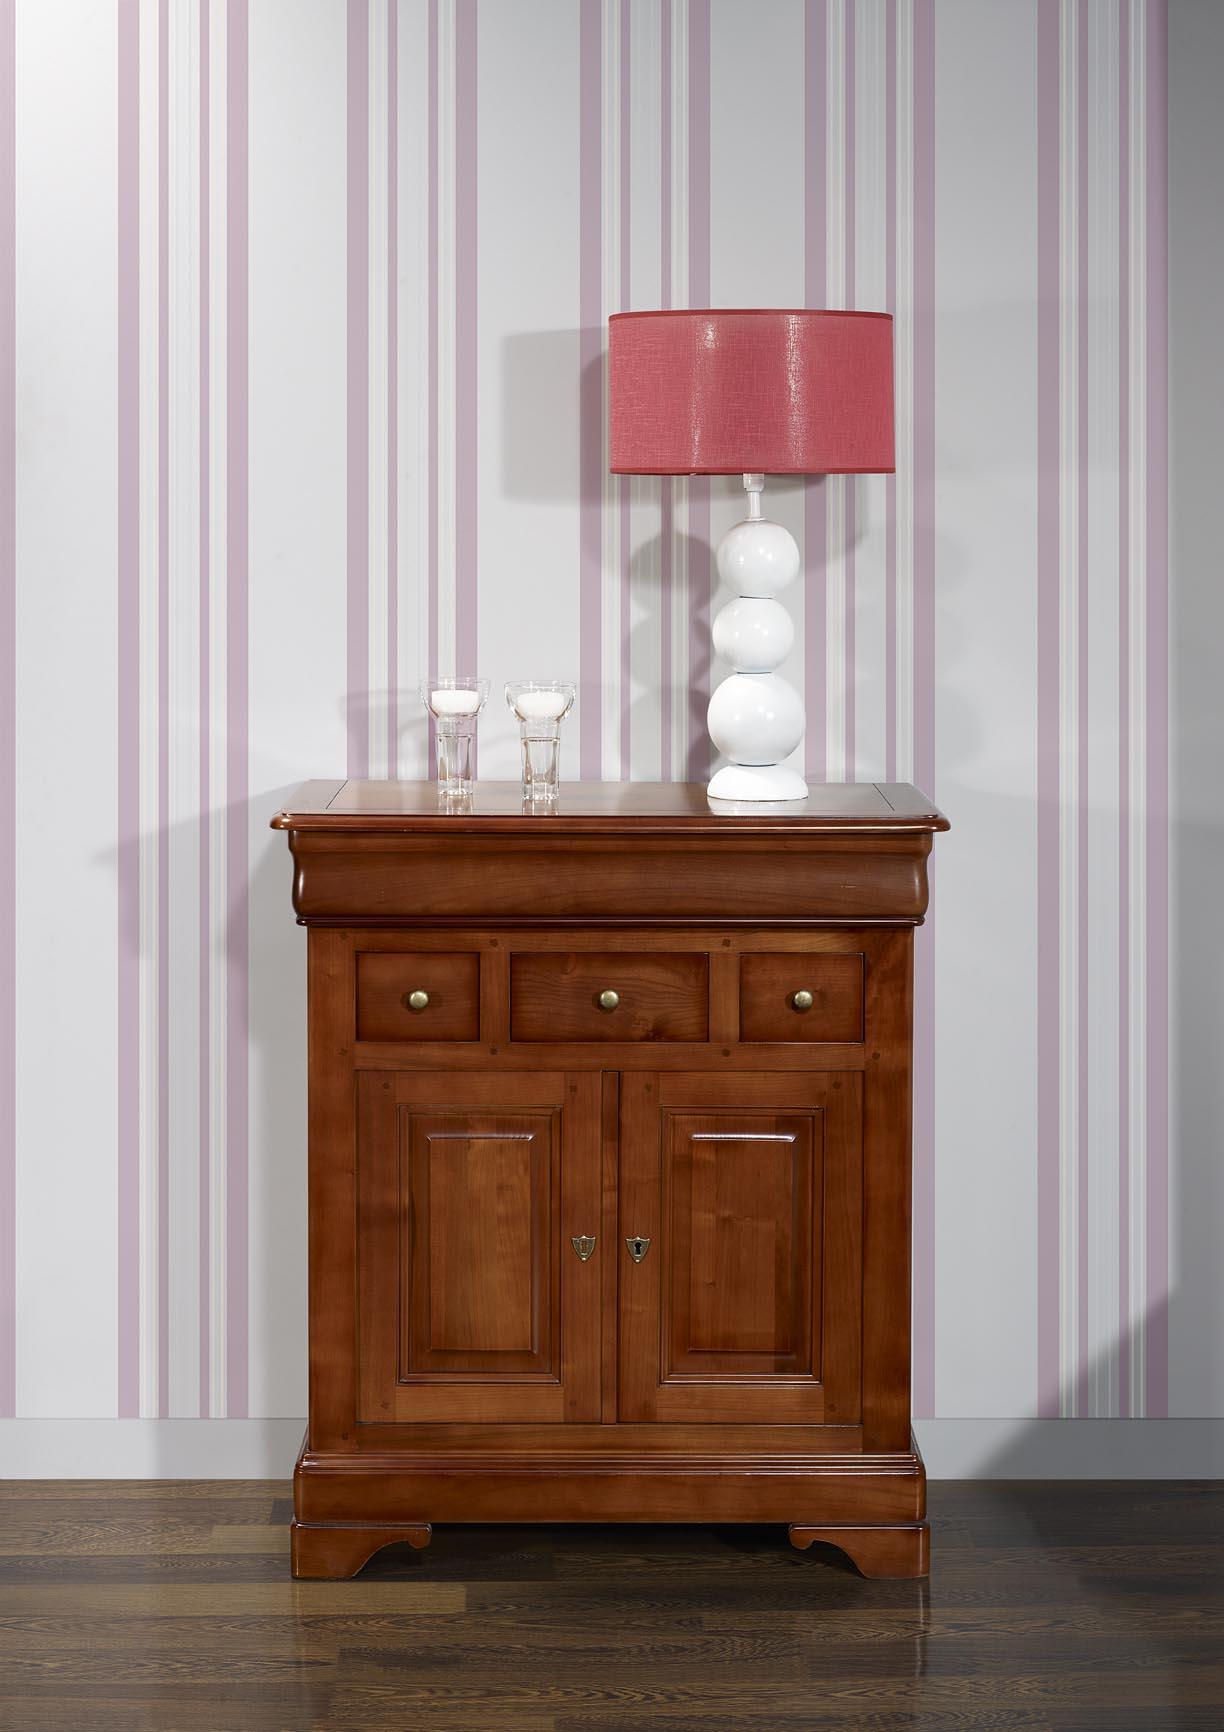 Petit buffet maria jos e en merisier massif de style louis philippe meuble en merisier massif - Meuble merisier style louis philippe ...